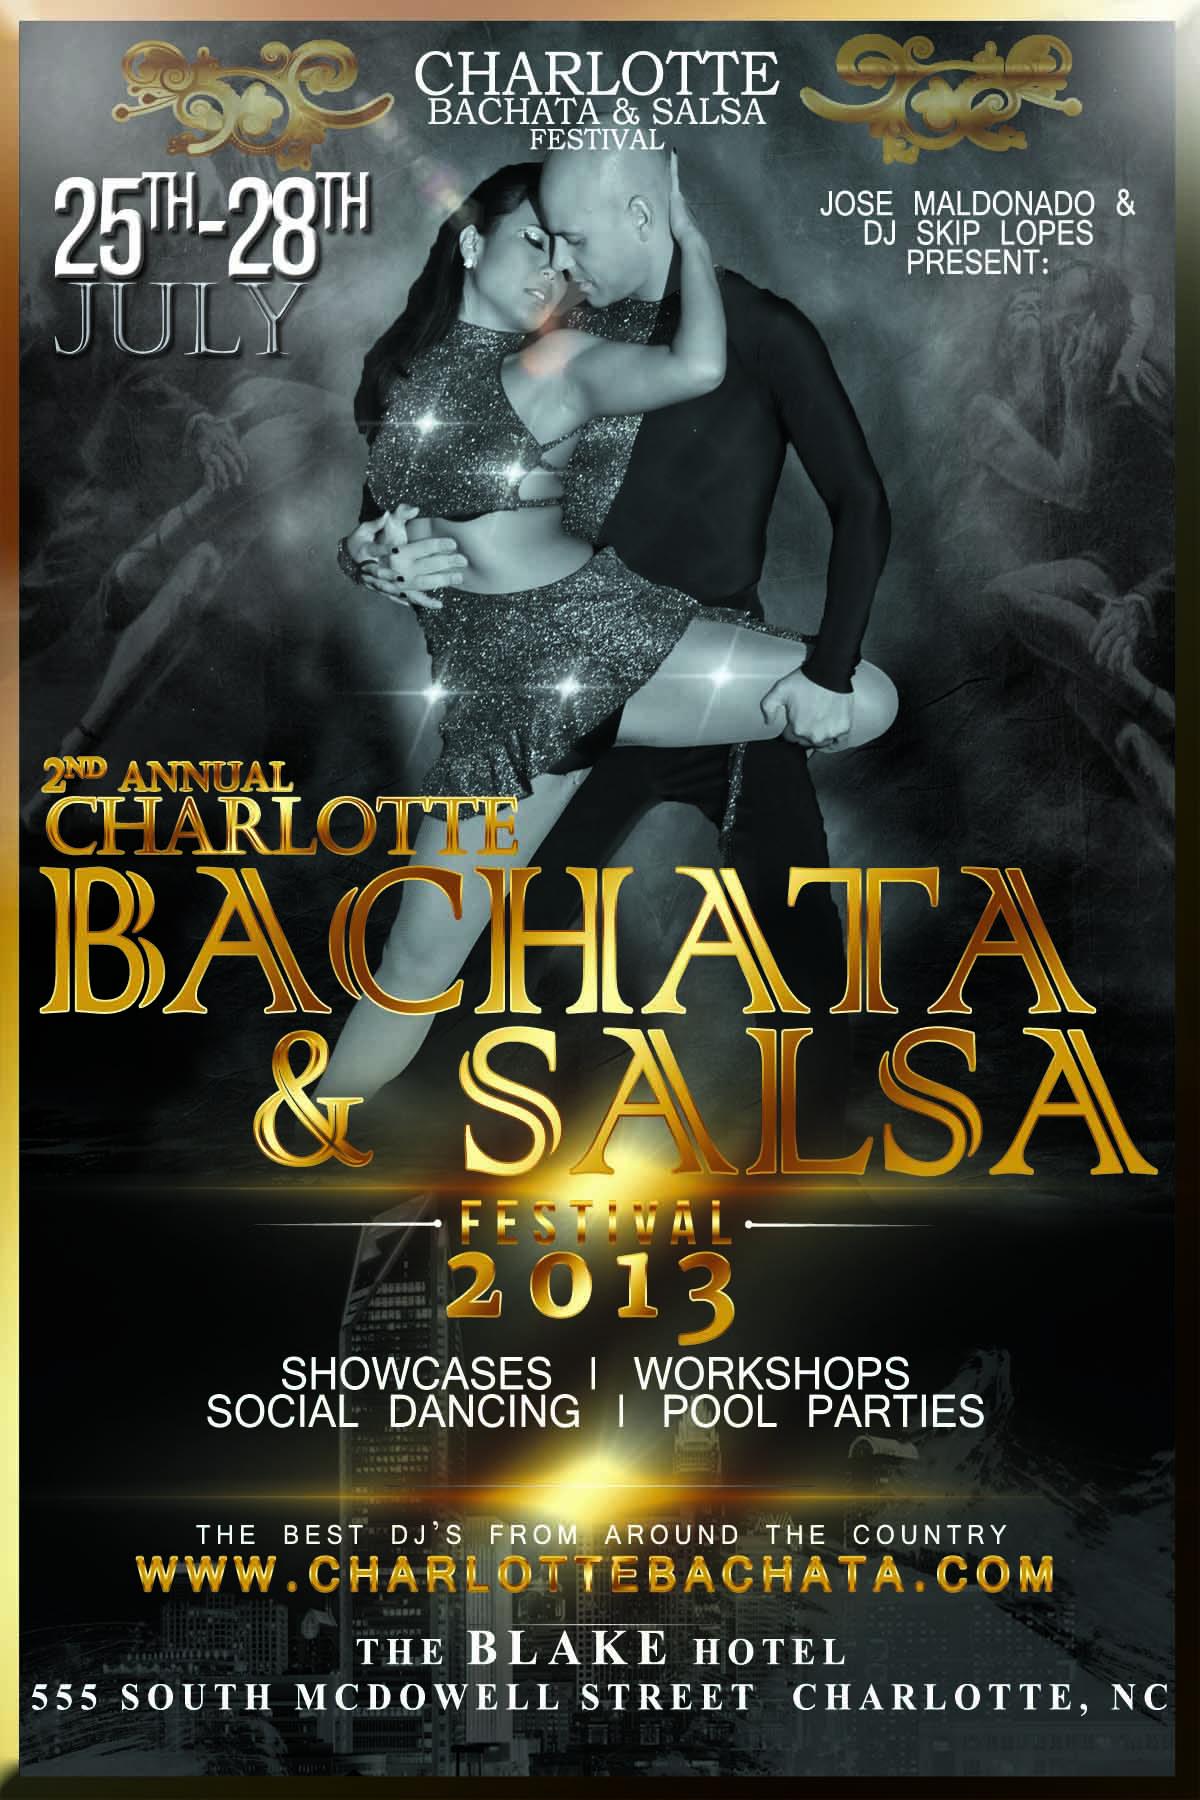 Charlotte Bachata & Salsa Festival Promo Flyer